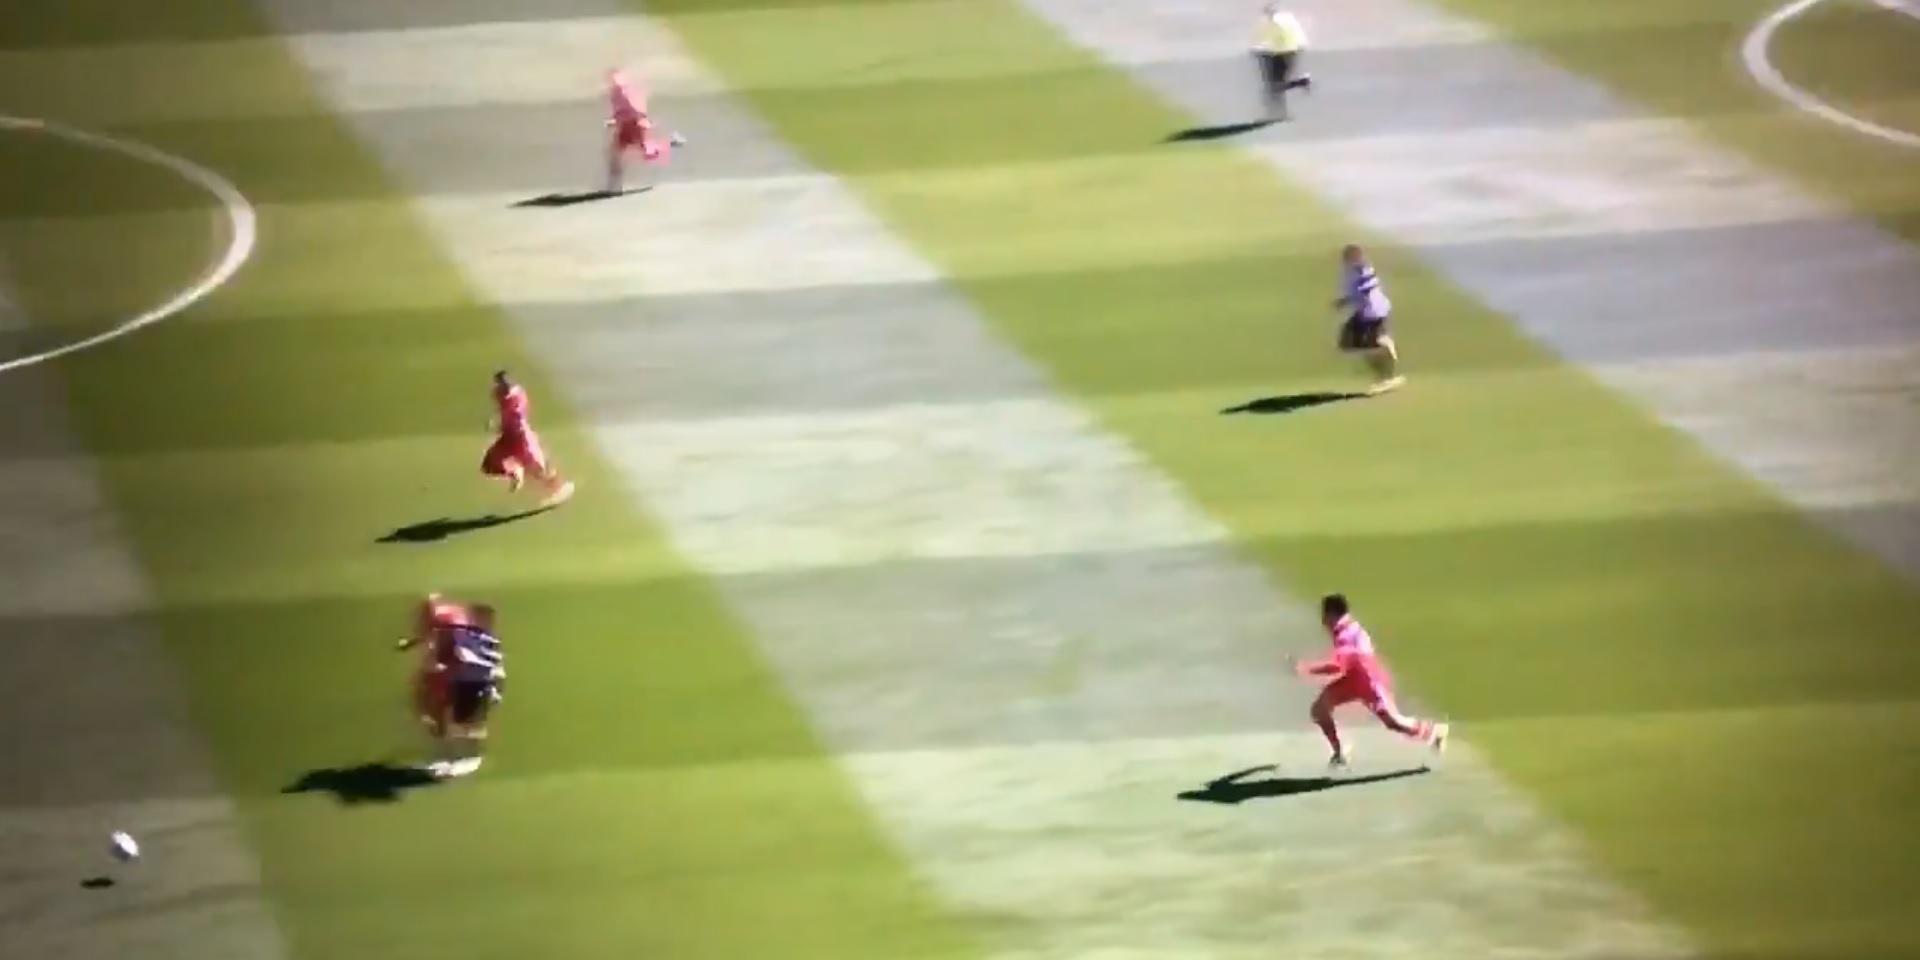 Newcastle star hits social media with joke at Fabinho's expense